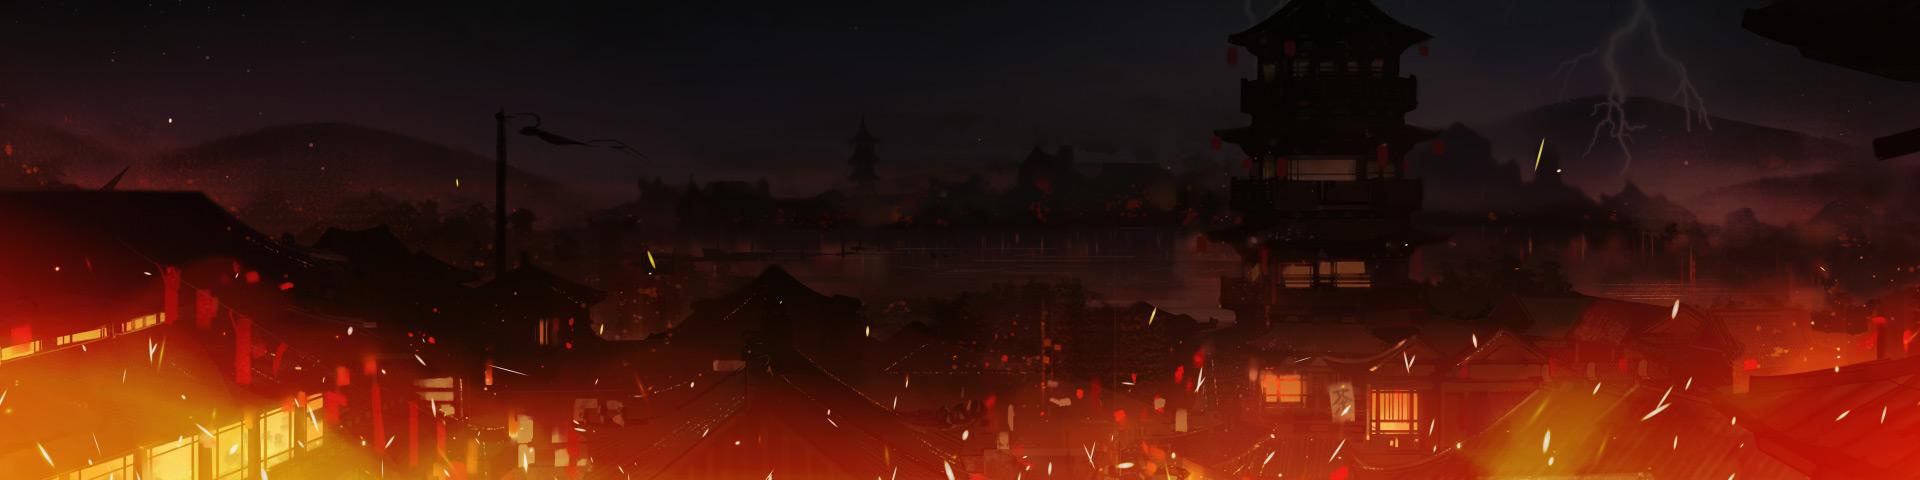 Banner-โปรโมท-วิหคชาดพิฆาตกล-BG